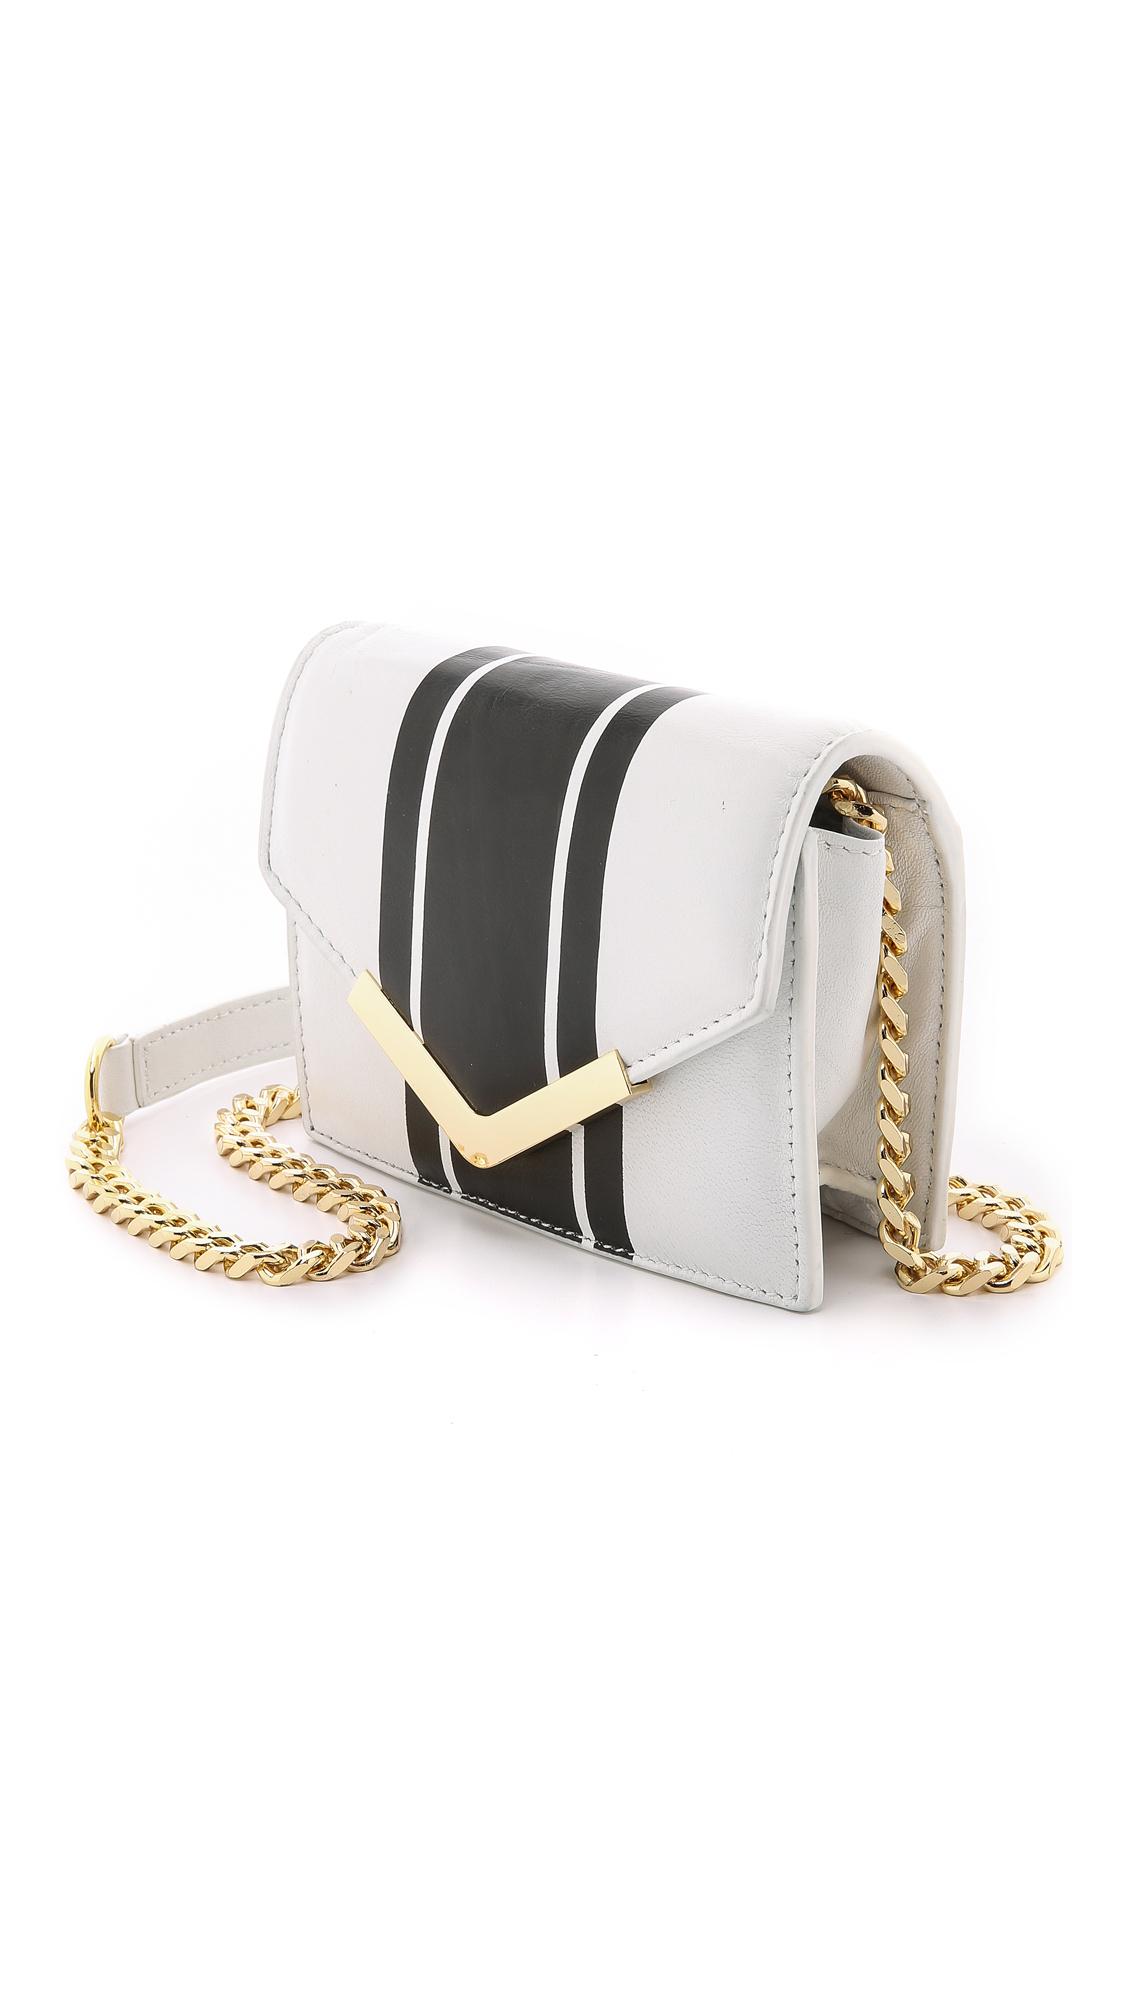 Cynthia Rowley Ella Cross Body Bag - White